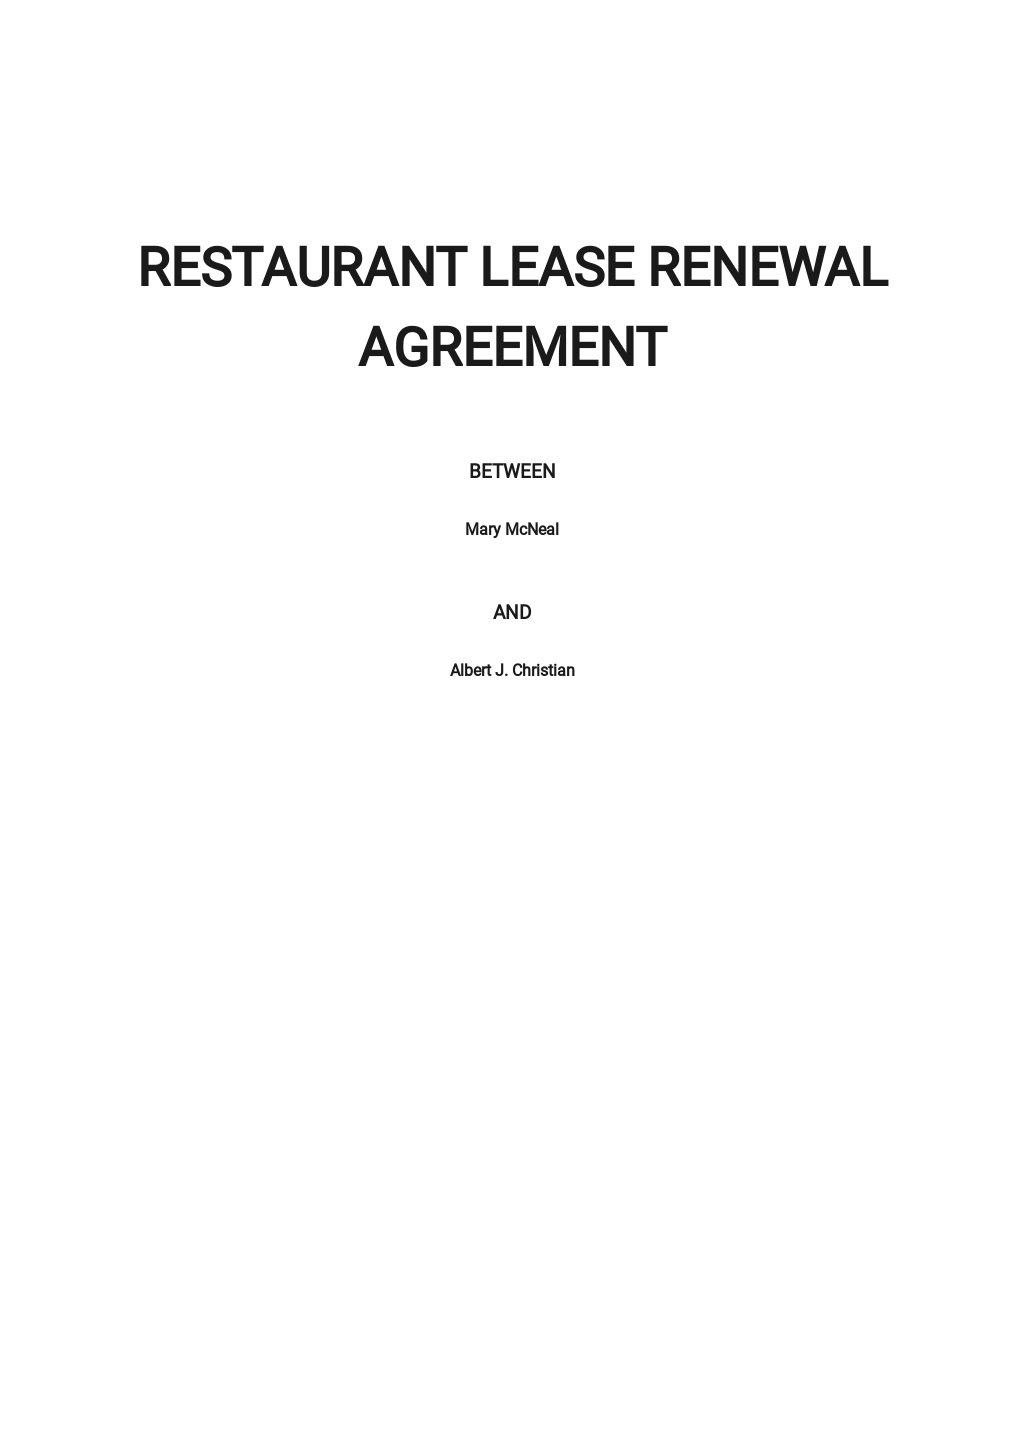 Restaurant Lease Renewal Agreement Template.jpe